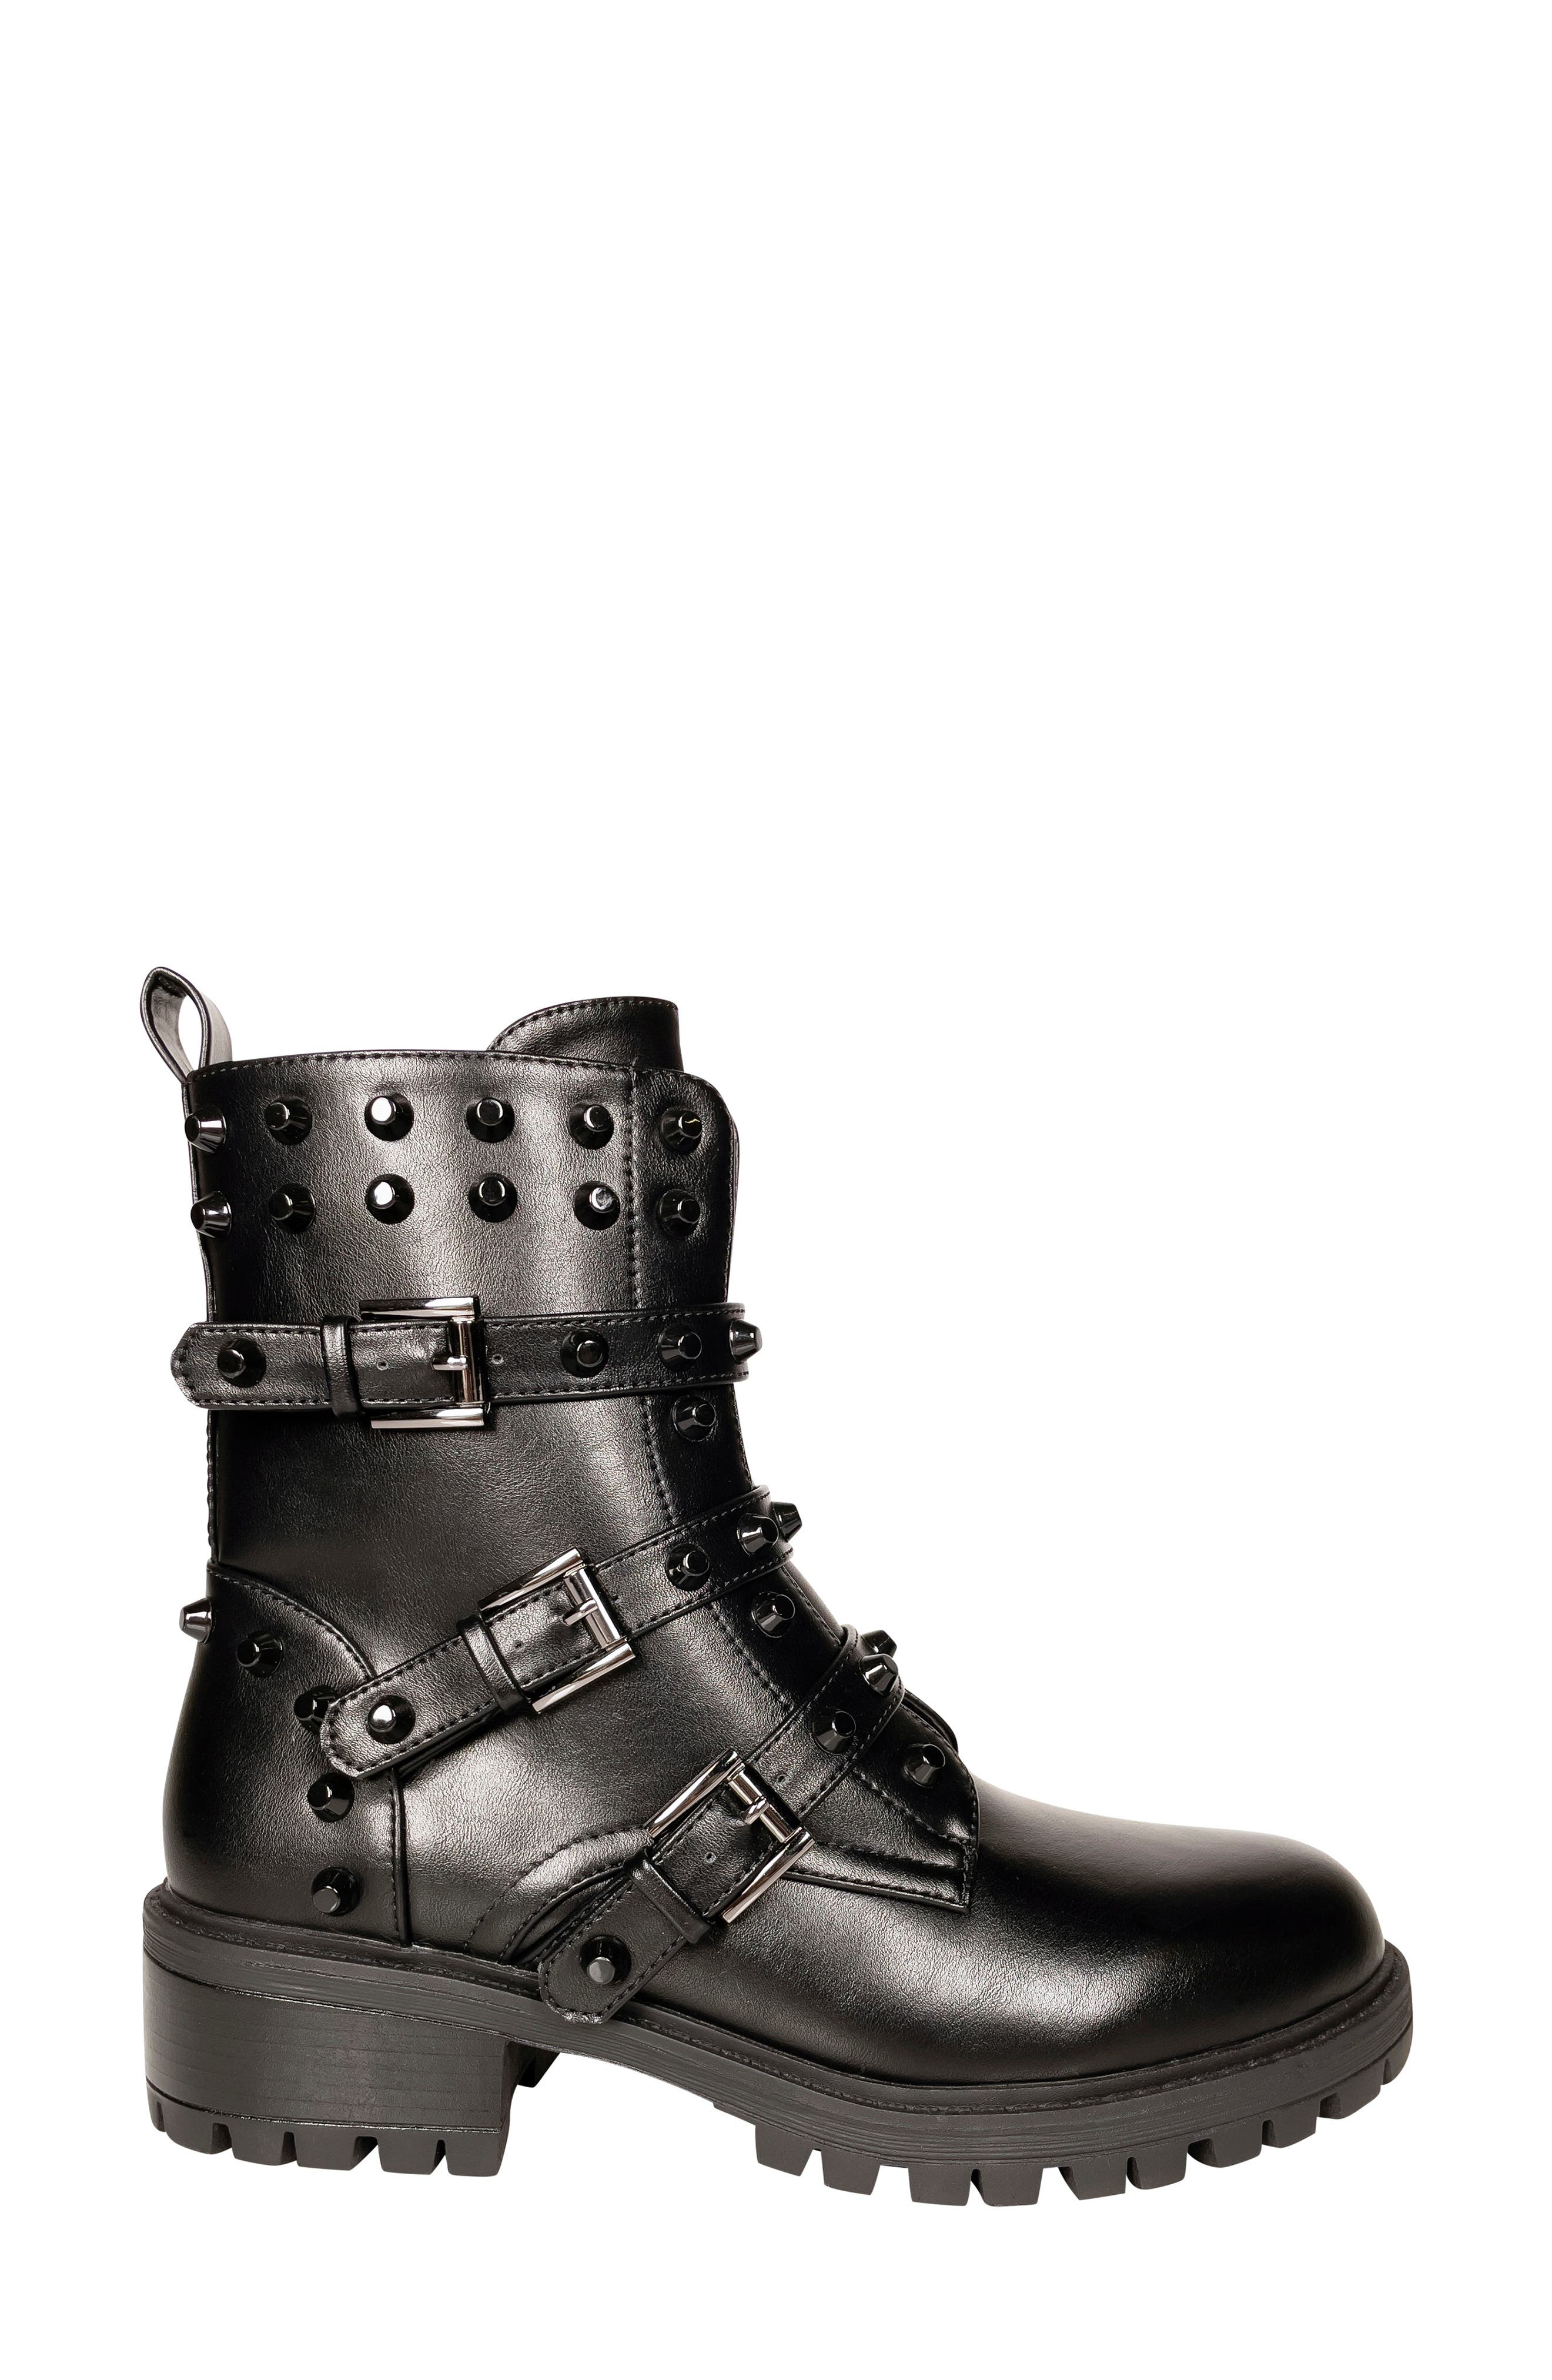 Lockheart Combat Boot